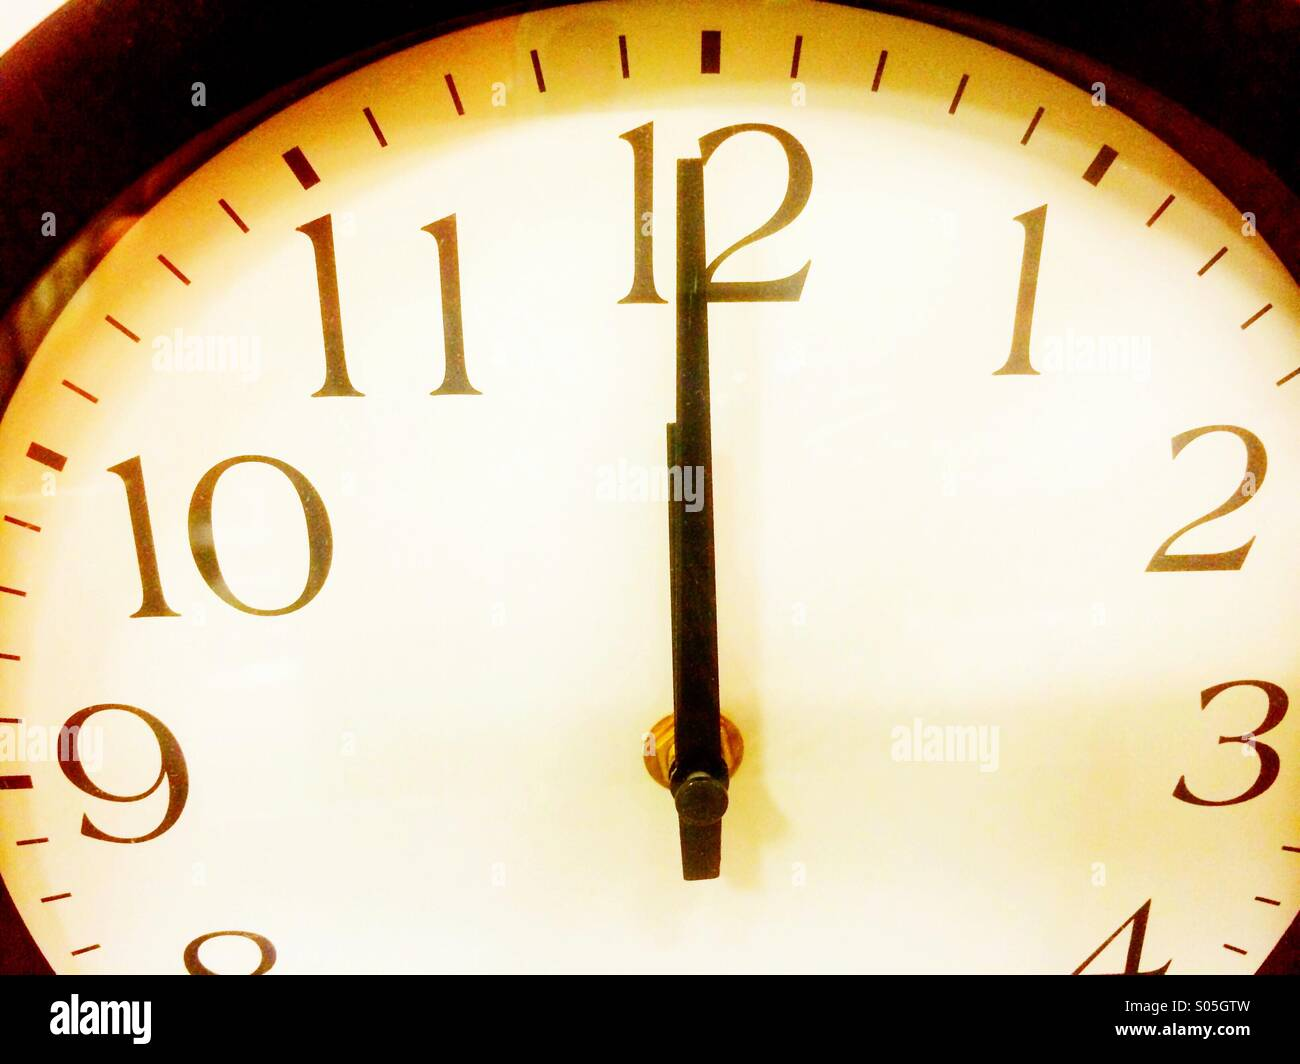 Hands of a clock at twelve o'clock. - Stock Image